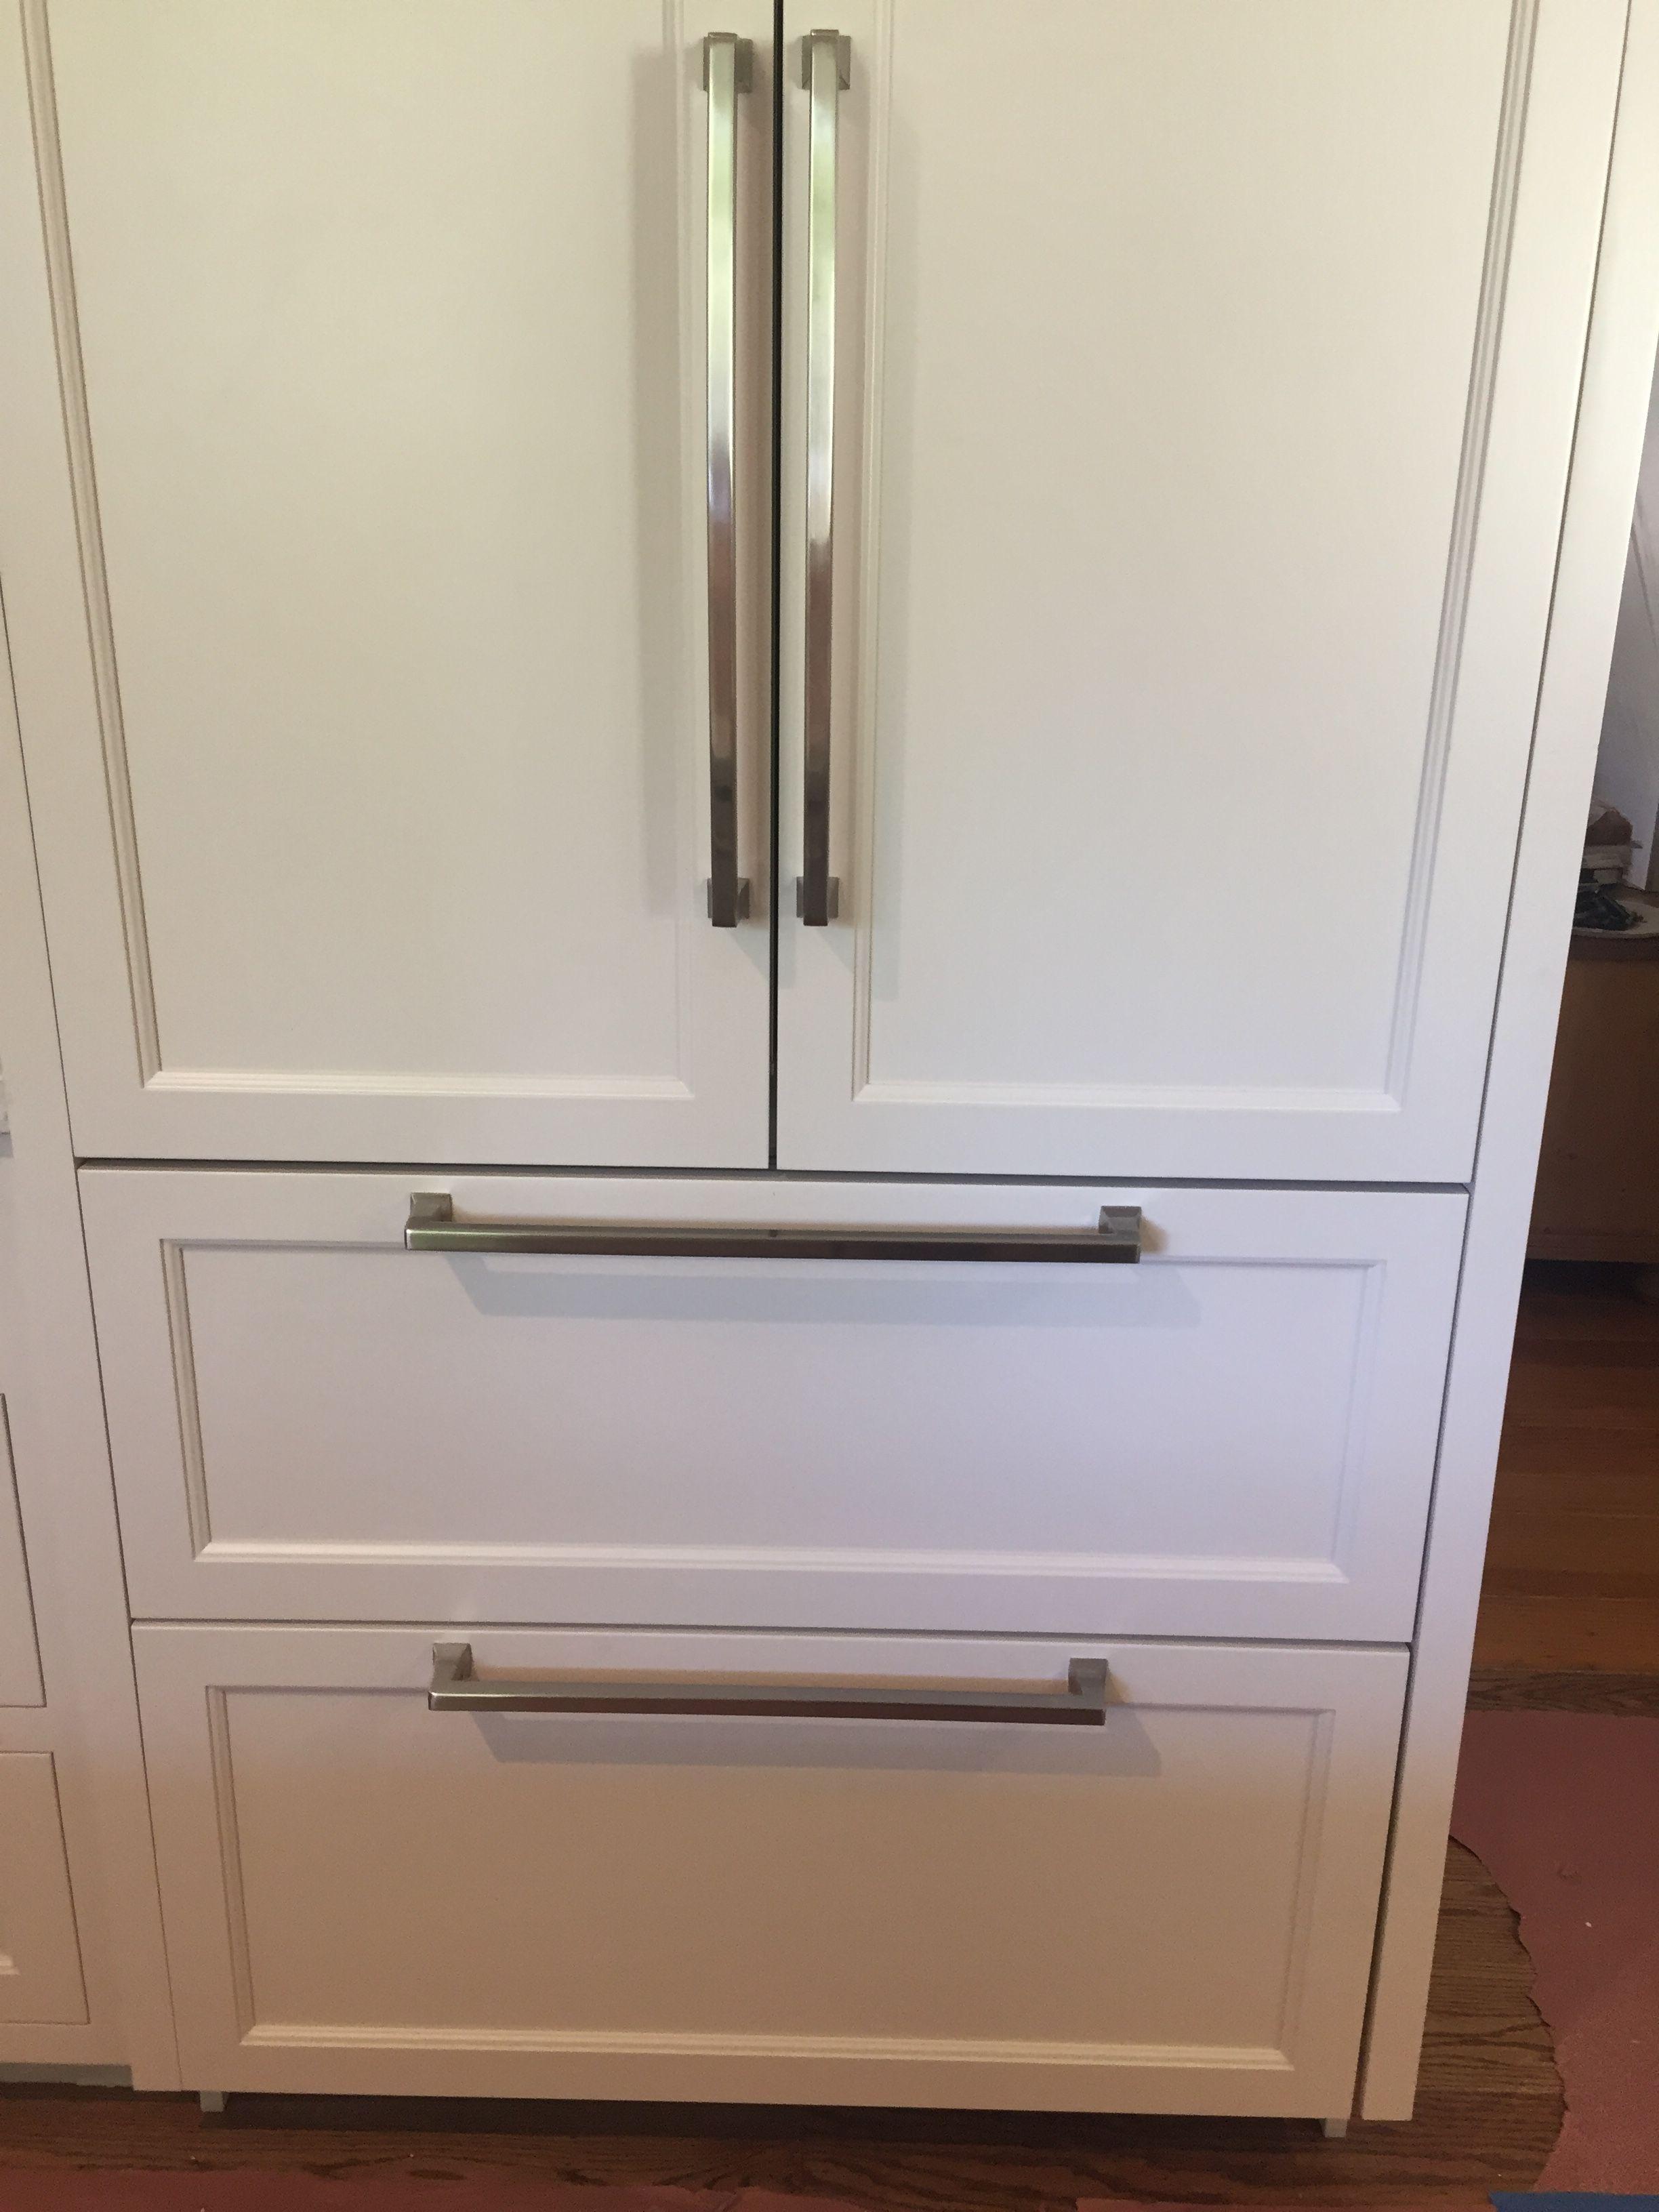 Emtek Alexander appliance pulls  these appliance pulls